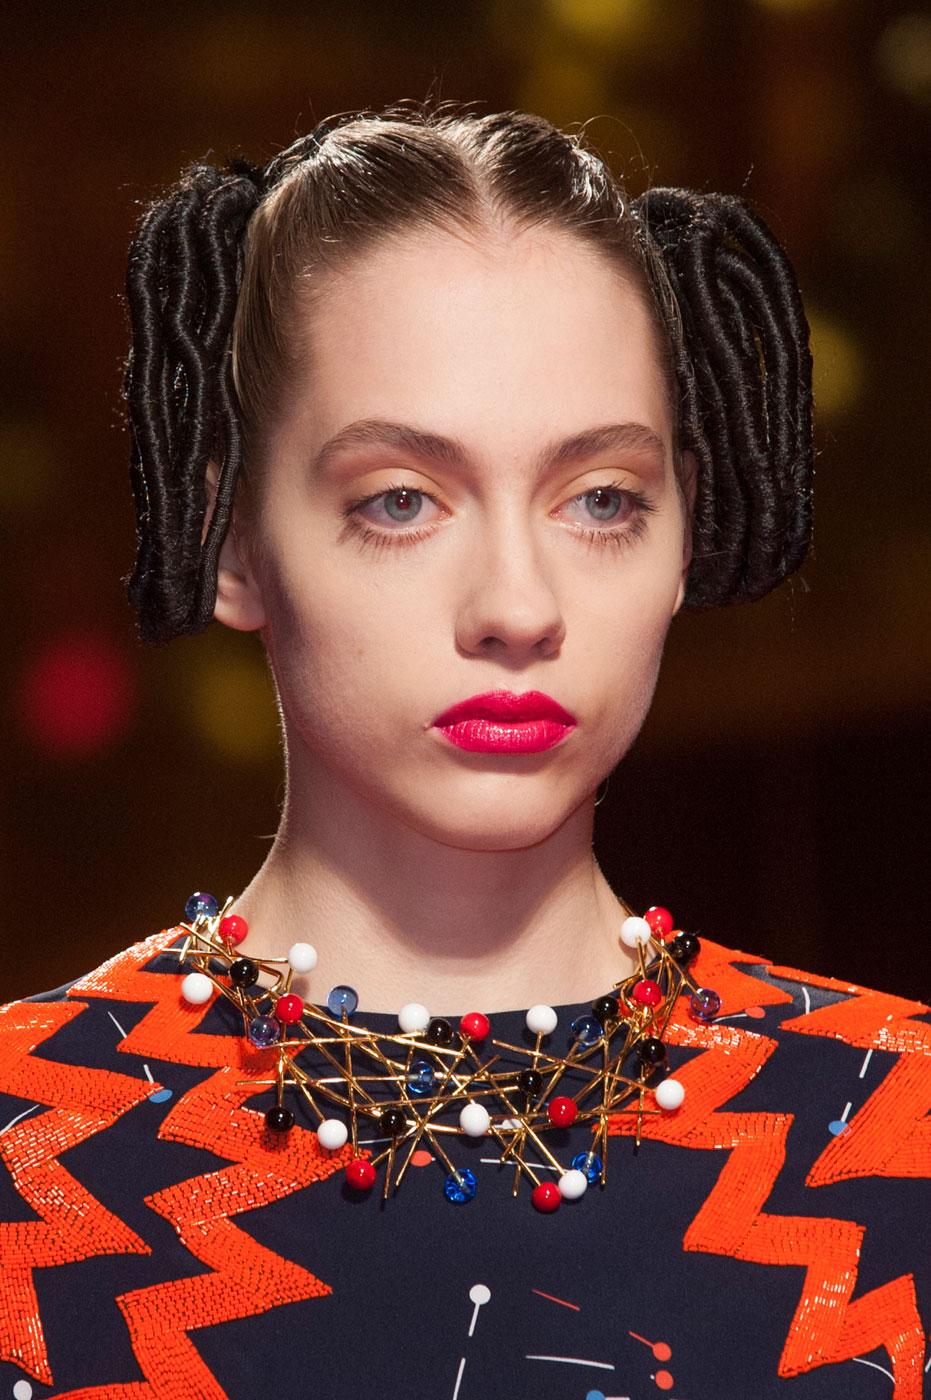 Schiaparelli-fashion-runway-show-close-ups-haute-couture-paris-spring-summer-2015-the-impression-35